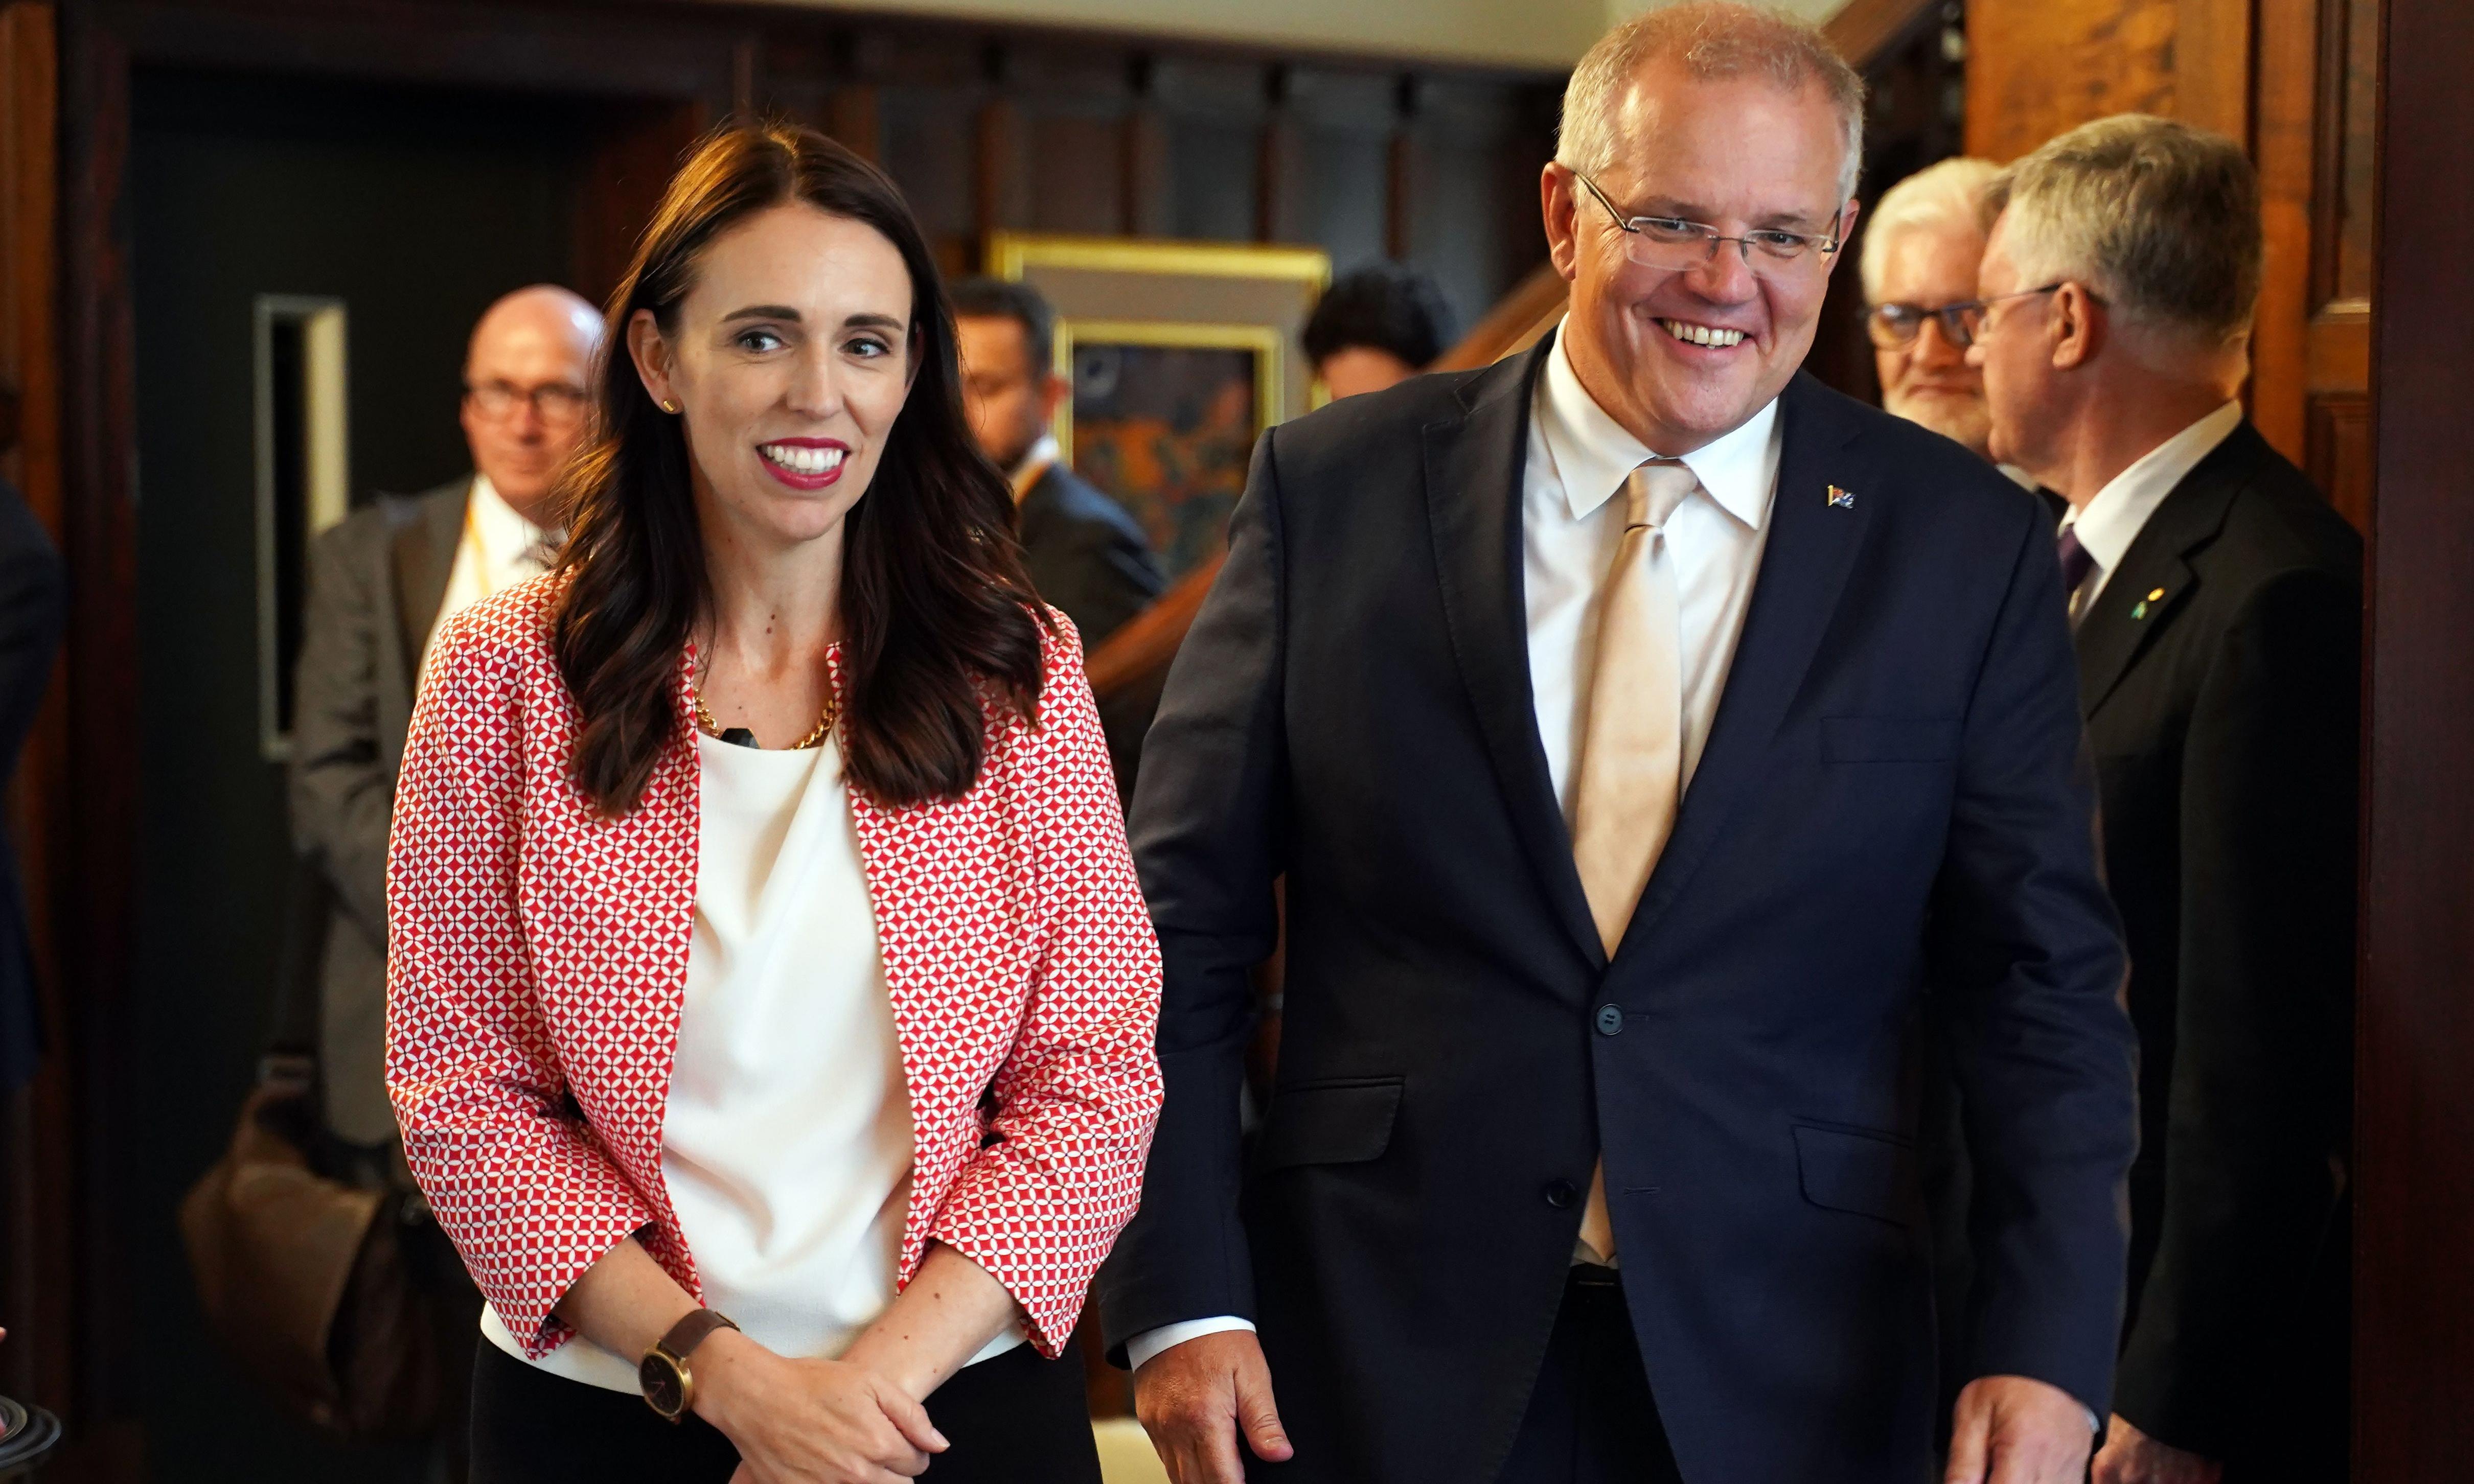 Jacinda Ardern tells Scott Morrison Australia's deportation policy 'corrosive'